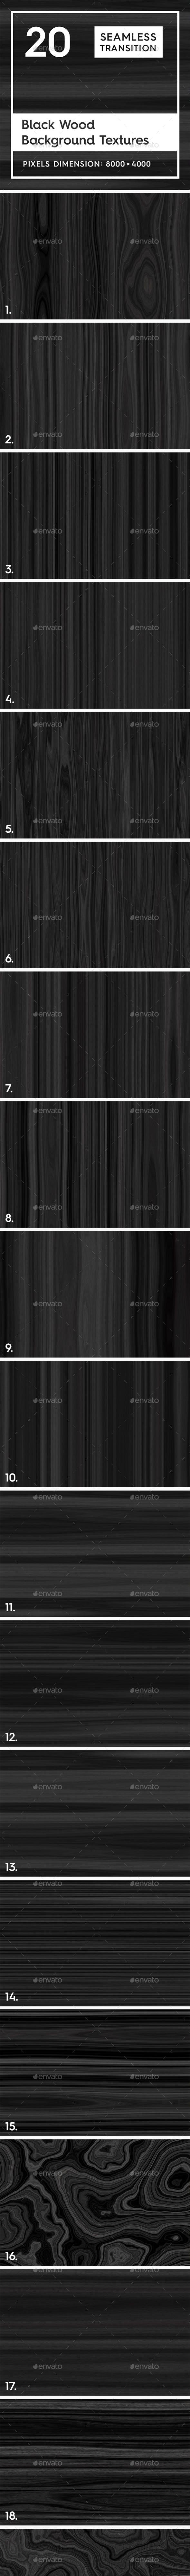 20 Black Wood Background Textures - 3DOcean Item for Sale